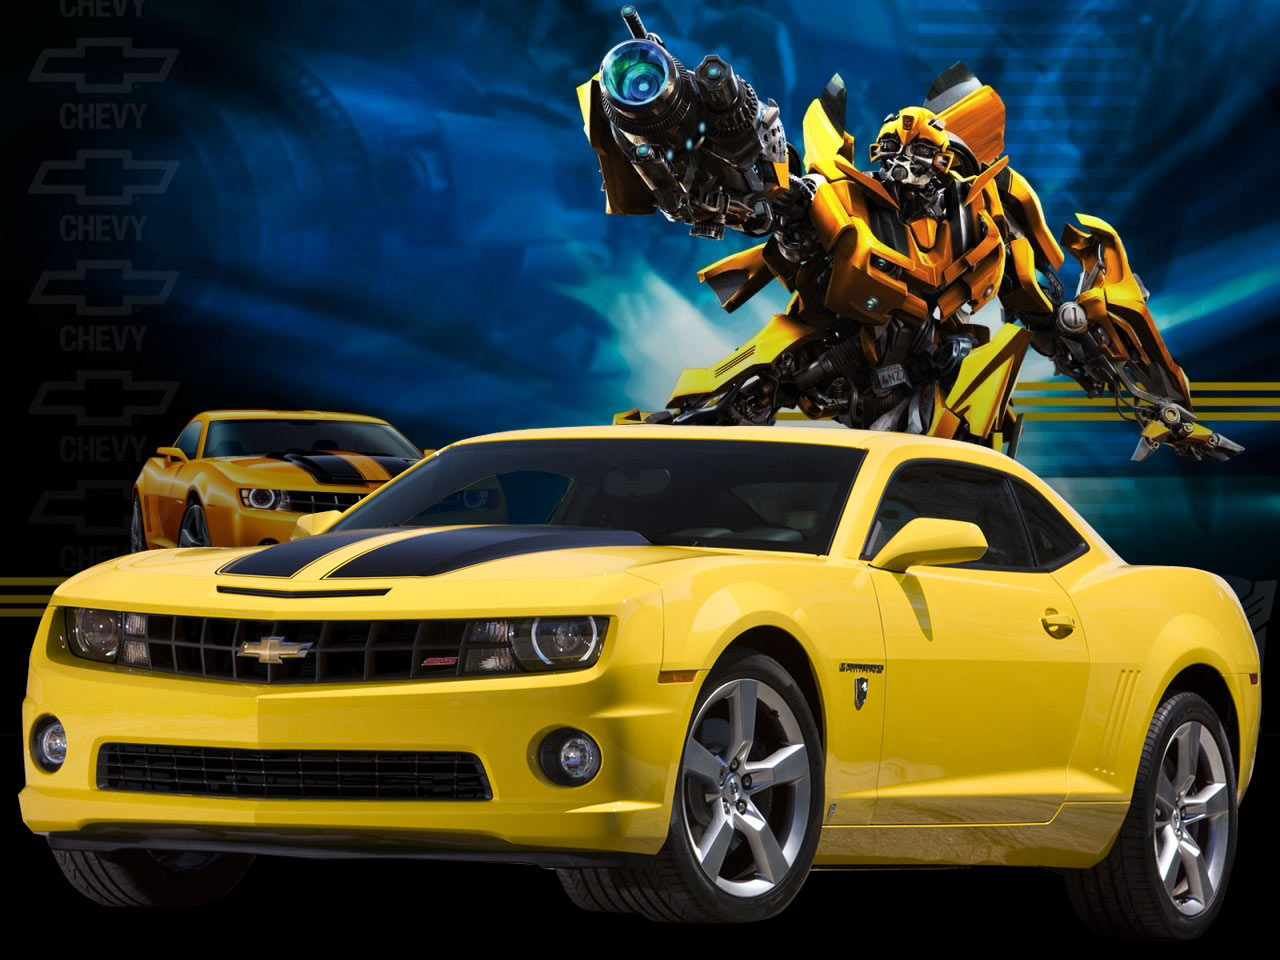 Bumblebee the transformers wallpaper 36901555 fanpop - Transformers bumblebee car wallpaper ...